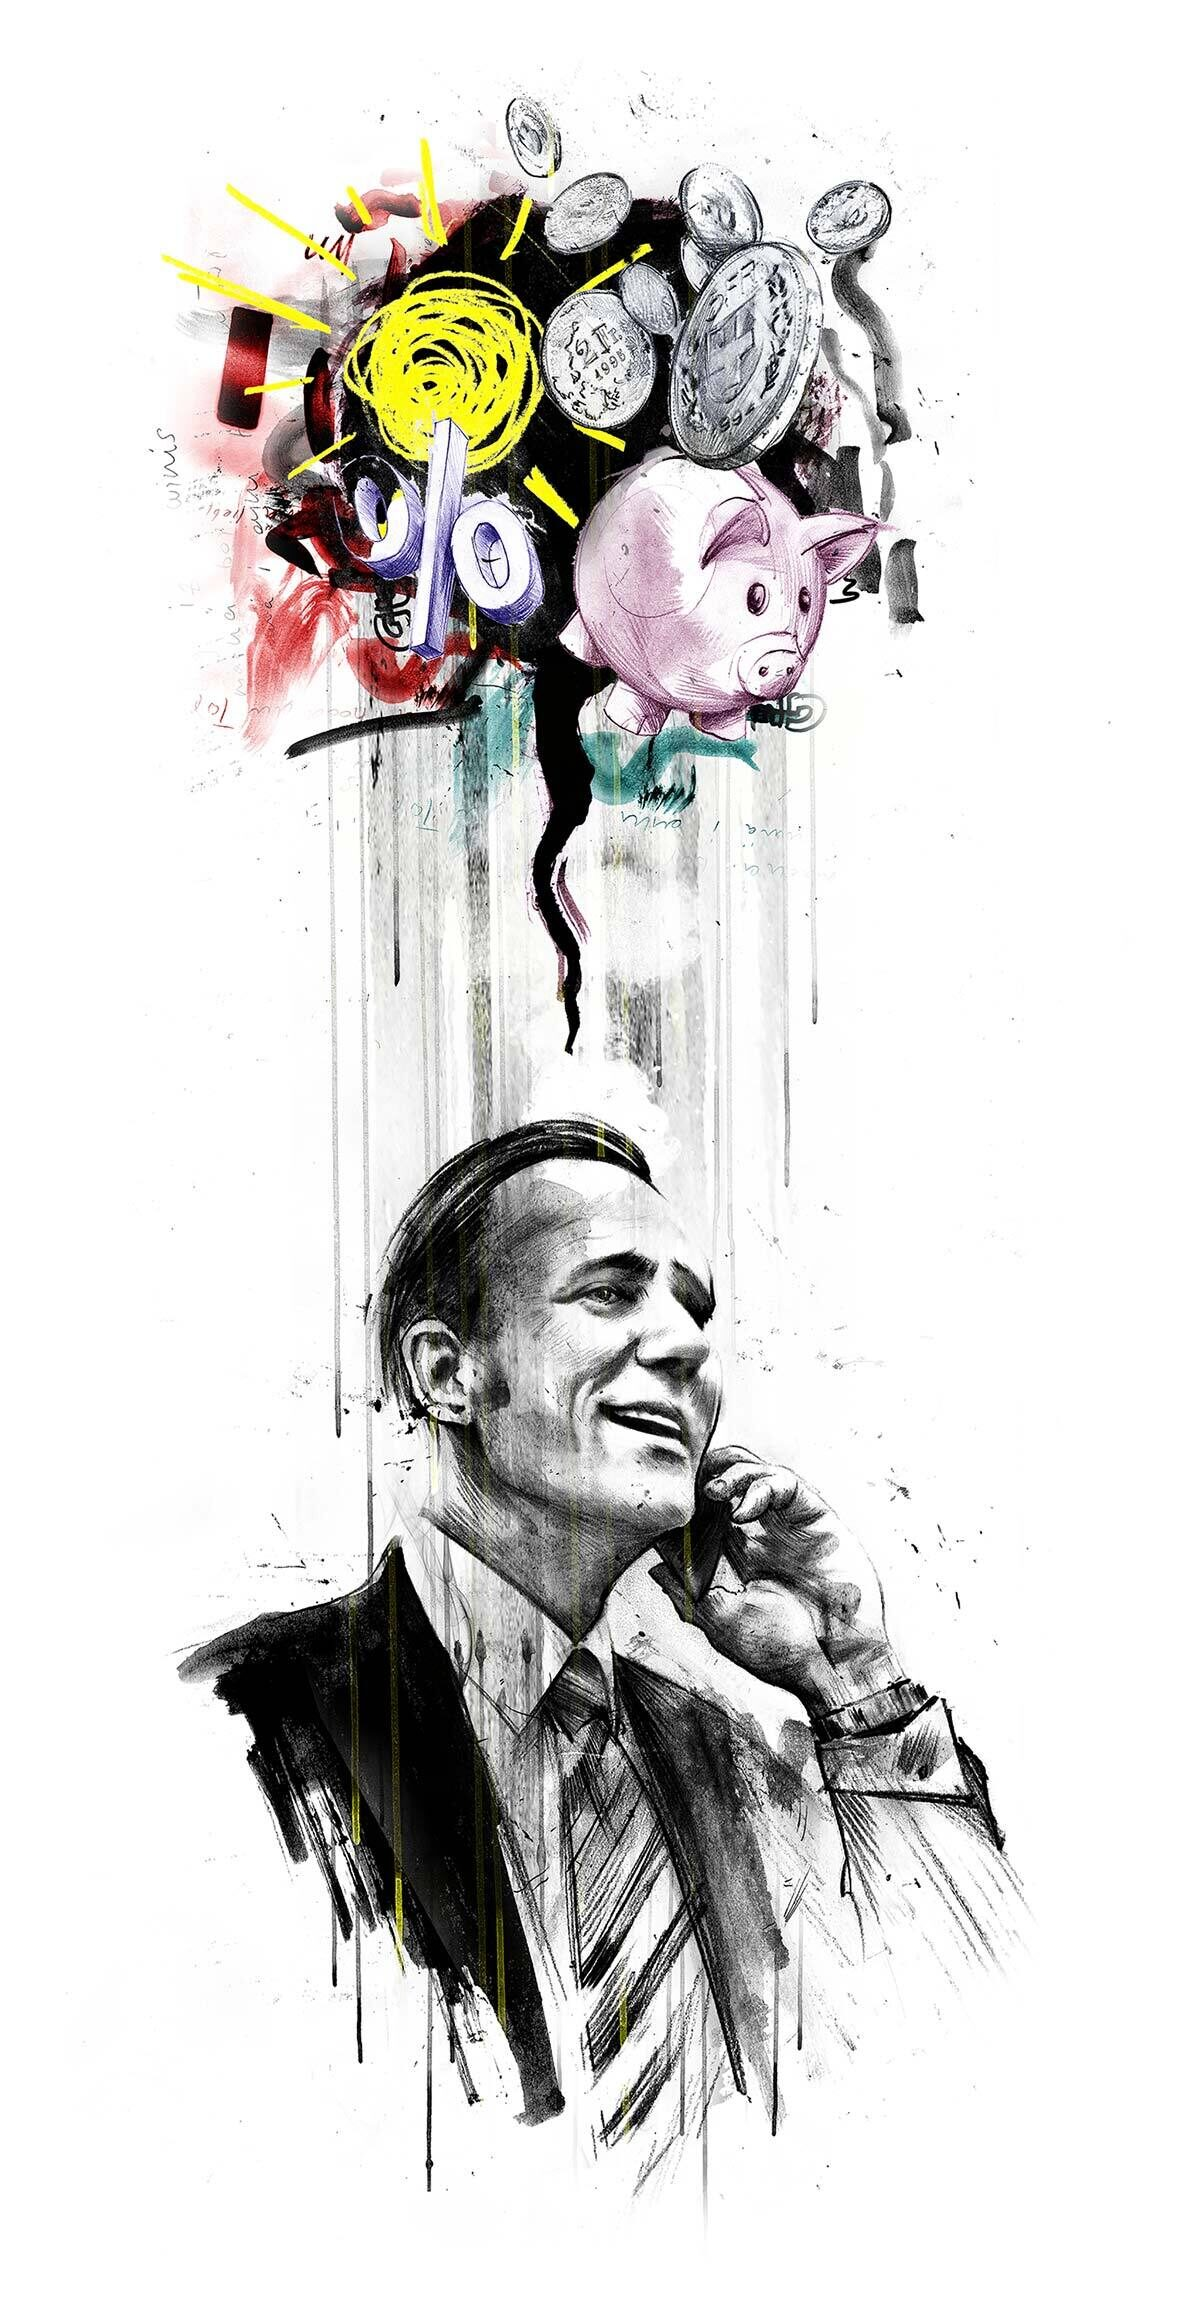 Editorial illustration business man - Kornel Illustration | Kornel Stadler portfolio